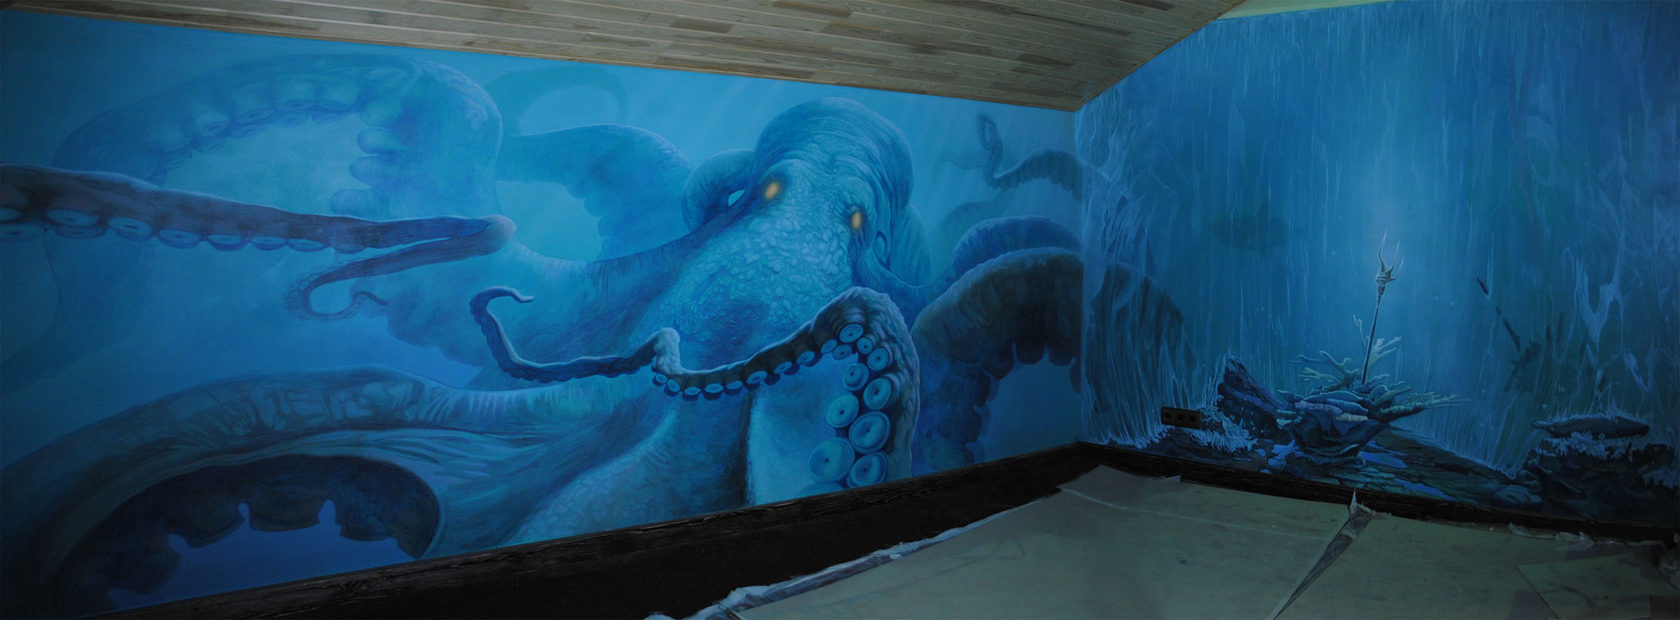 роспись стен, роспись стен в квартире, роспись стен на заказ